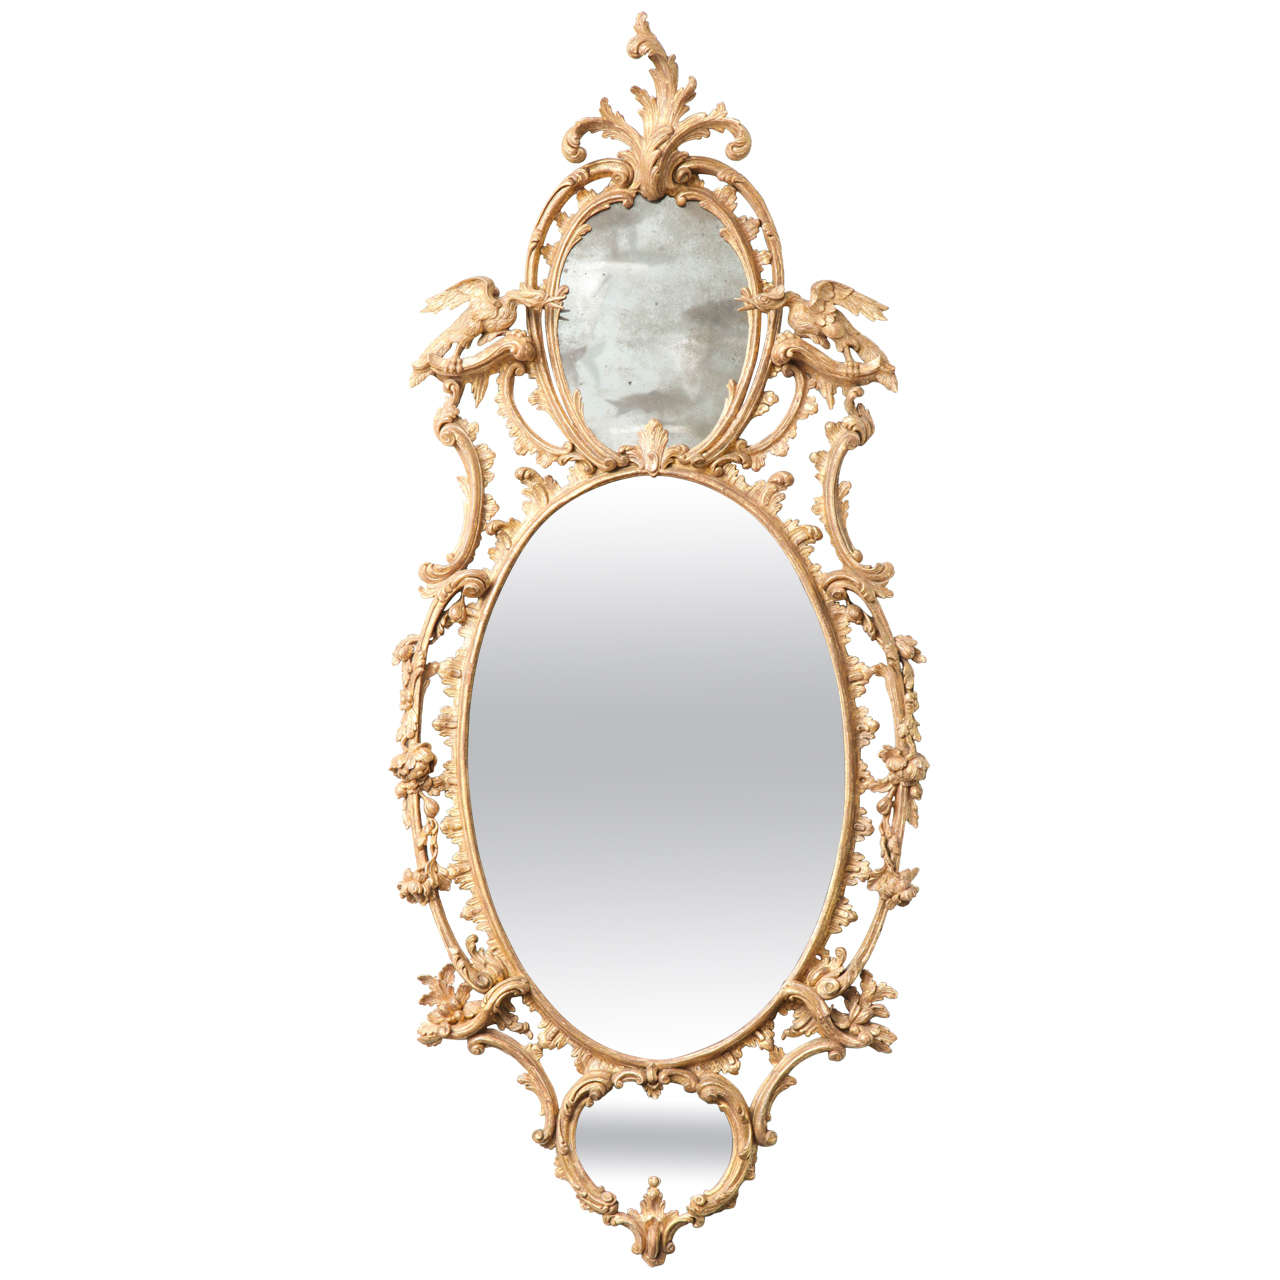 Very Fine George III Three-Plate Oval Mirror